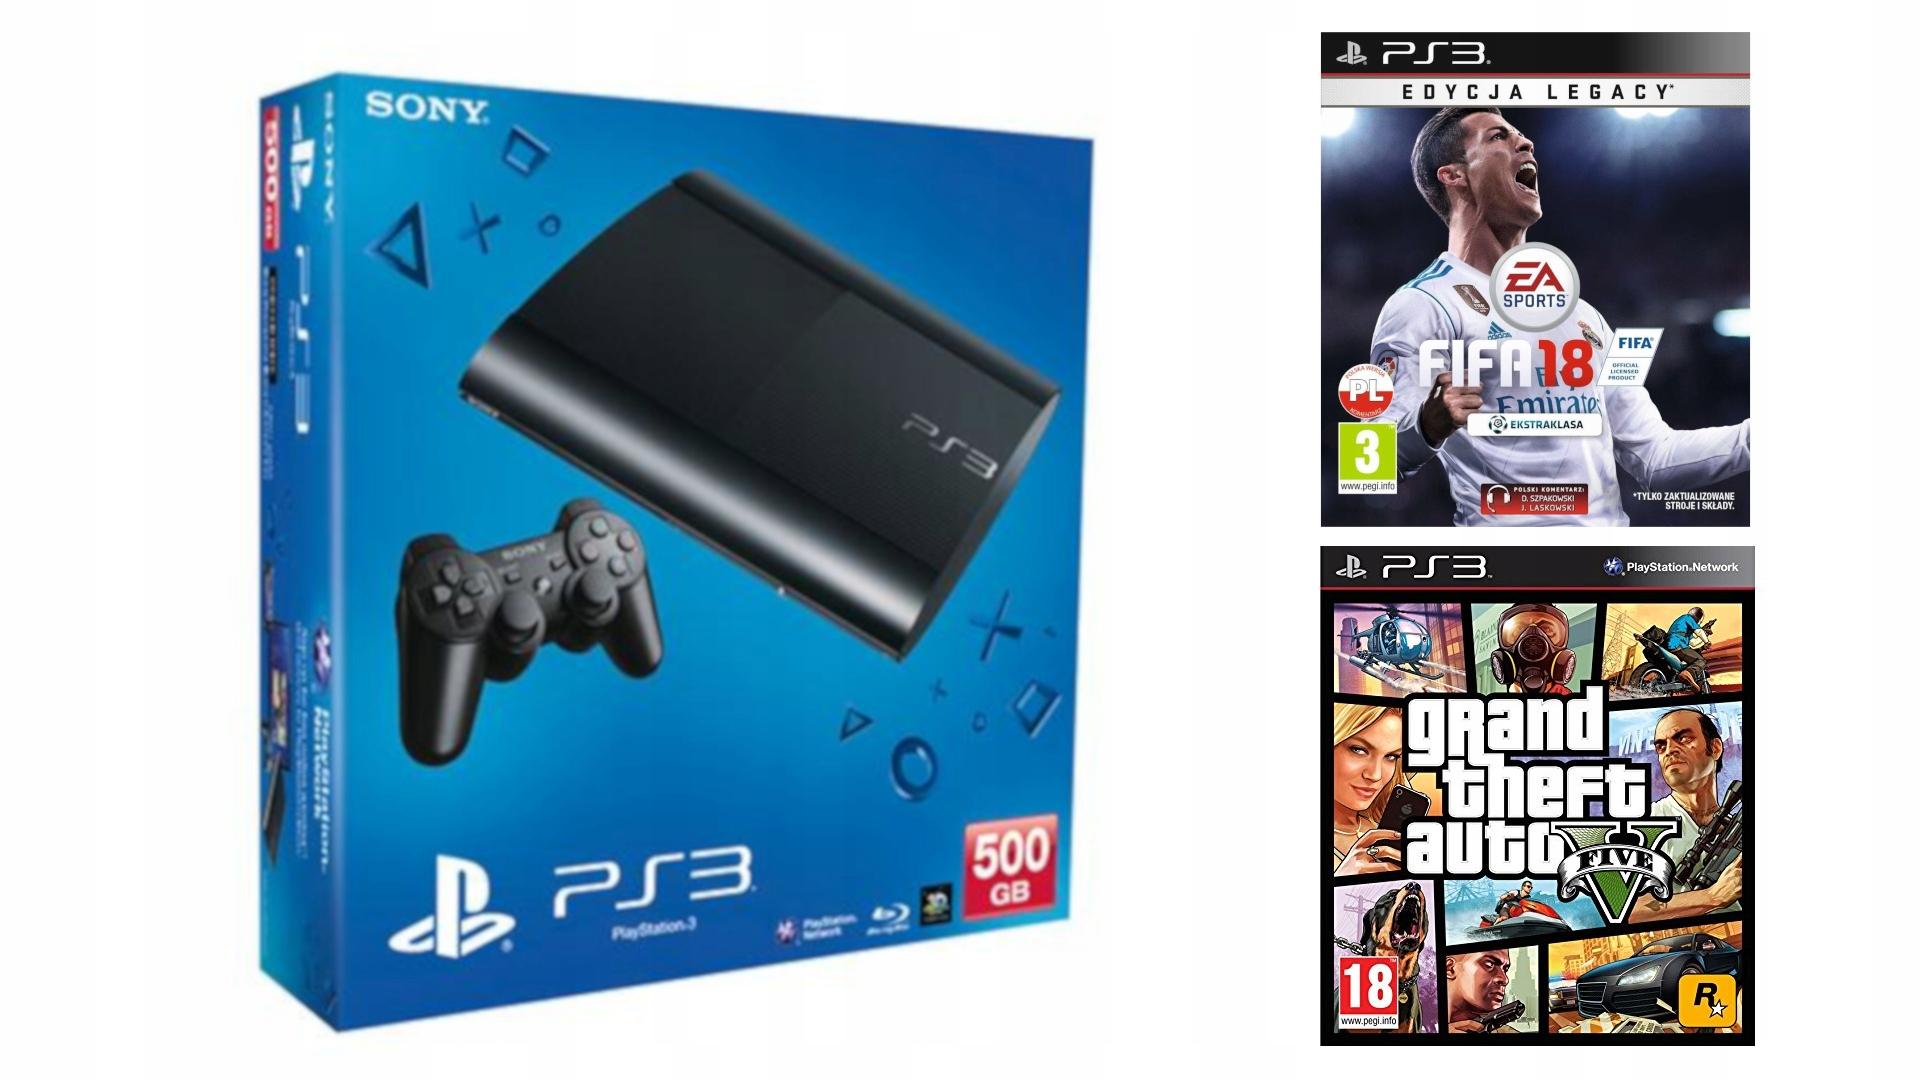 PS3 PLAYSTATION 3 # 500GB # FIFA 18 # GTA V #